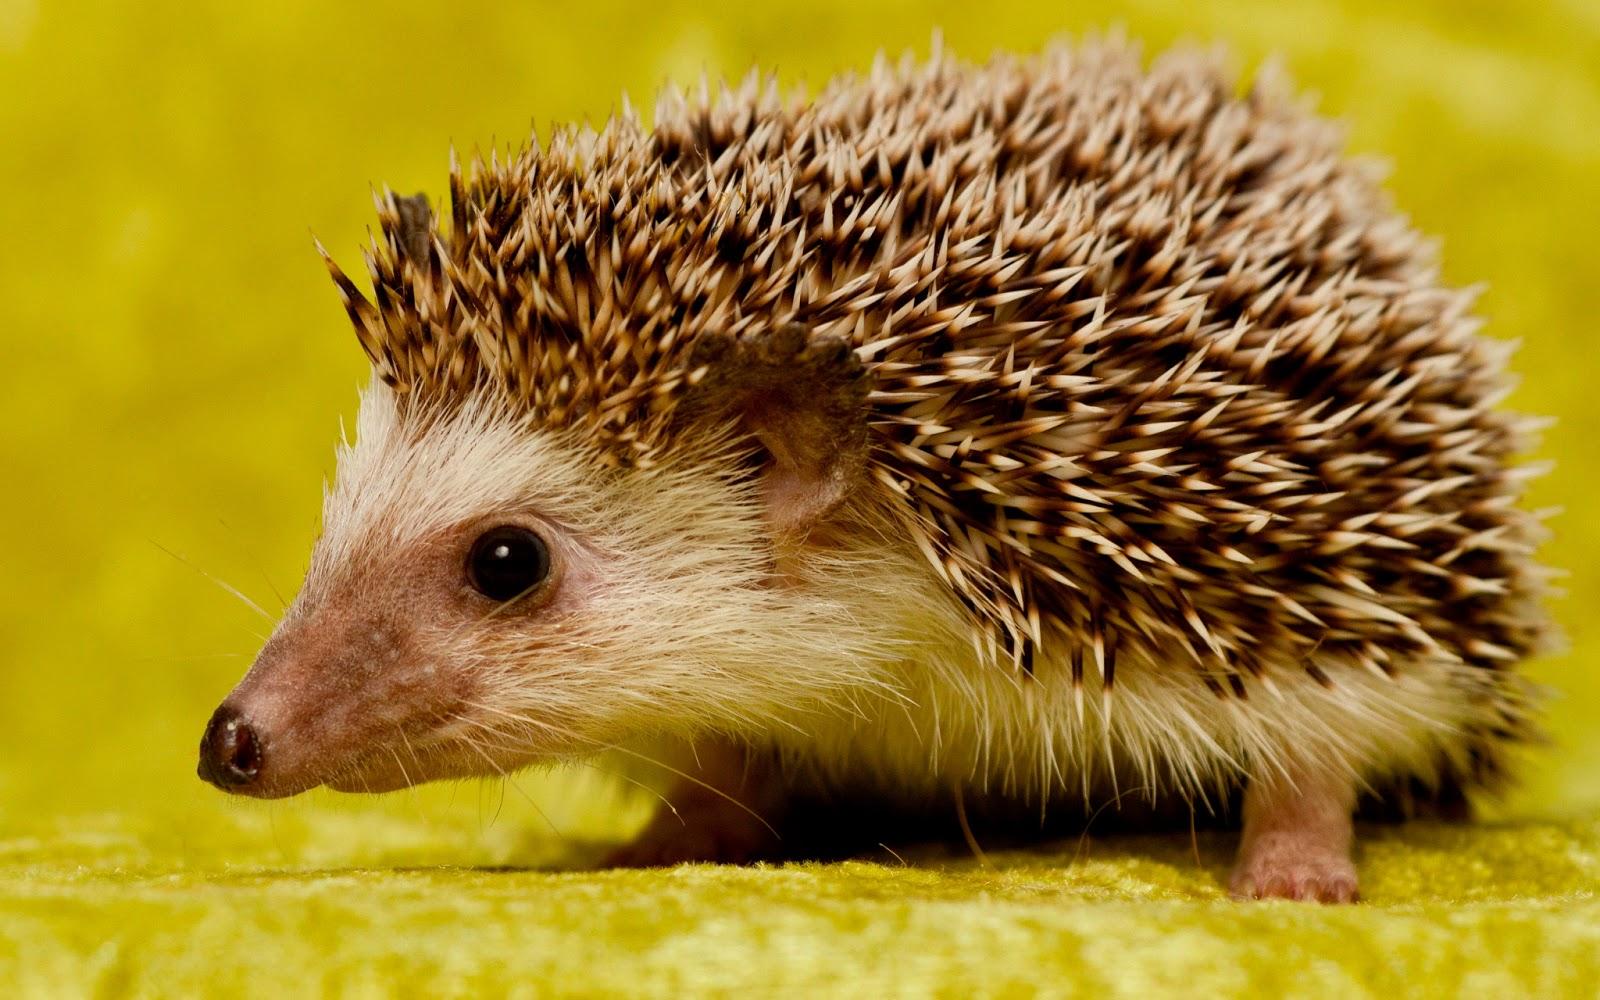 Animales Raros: El Erizo Común